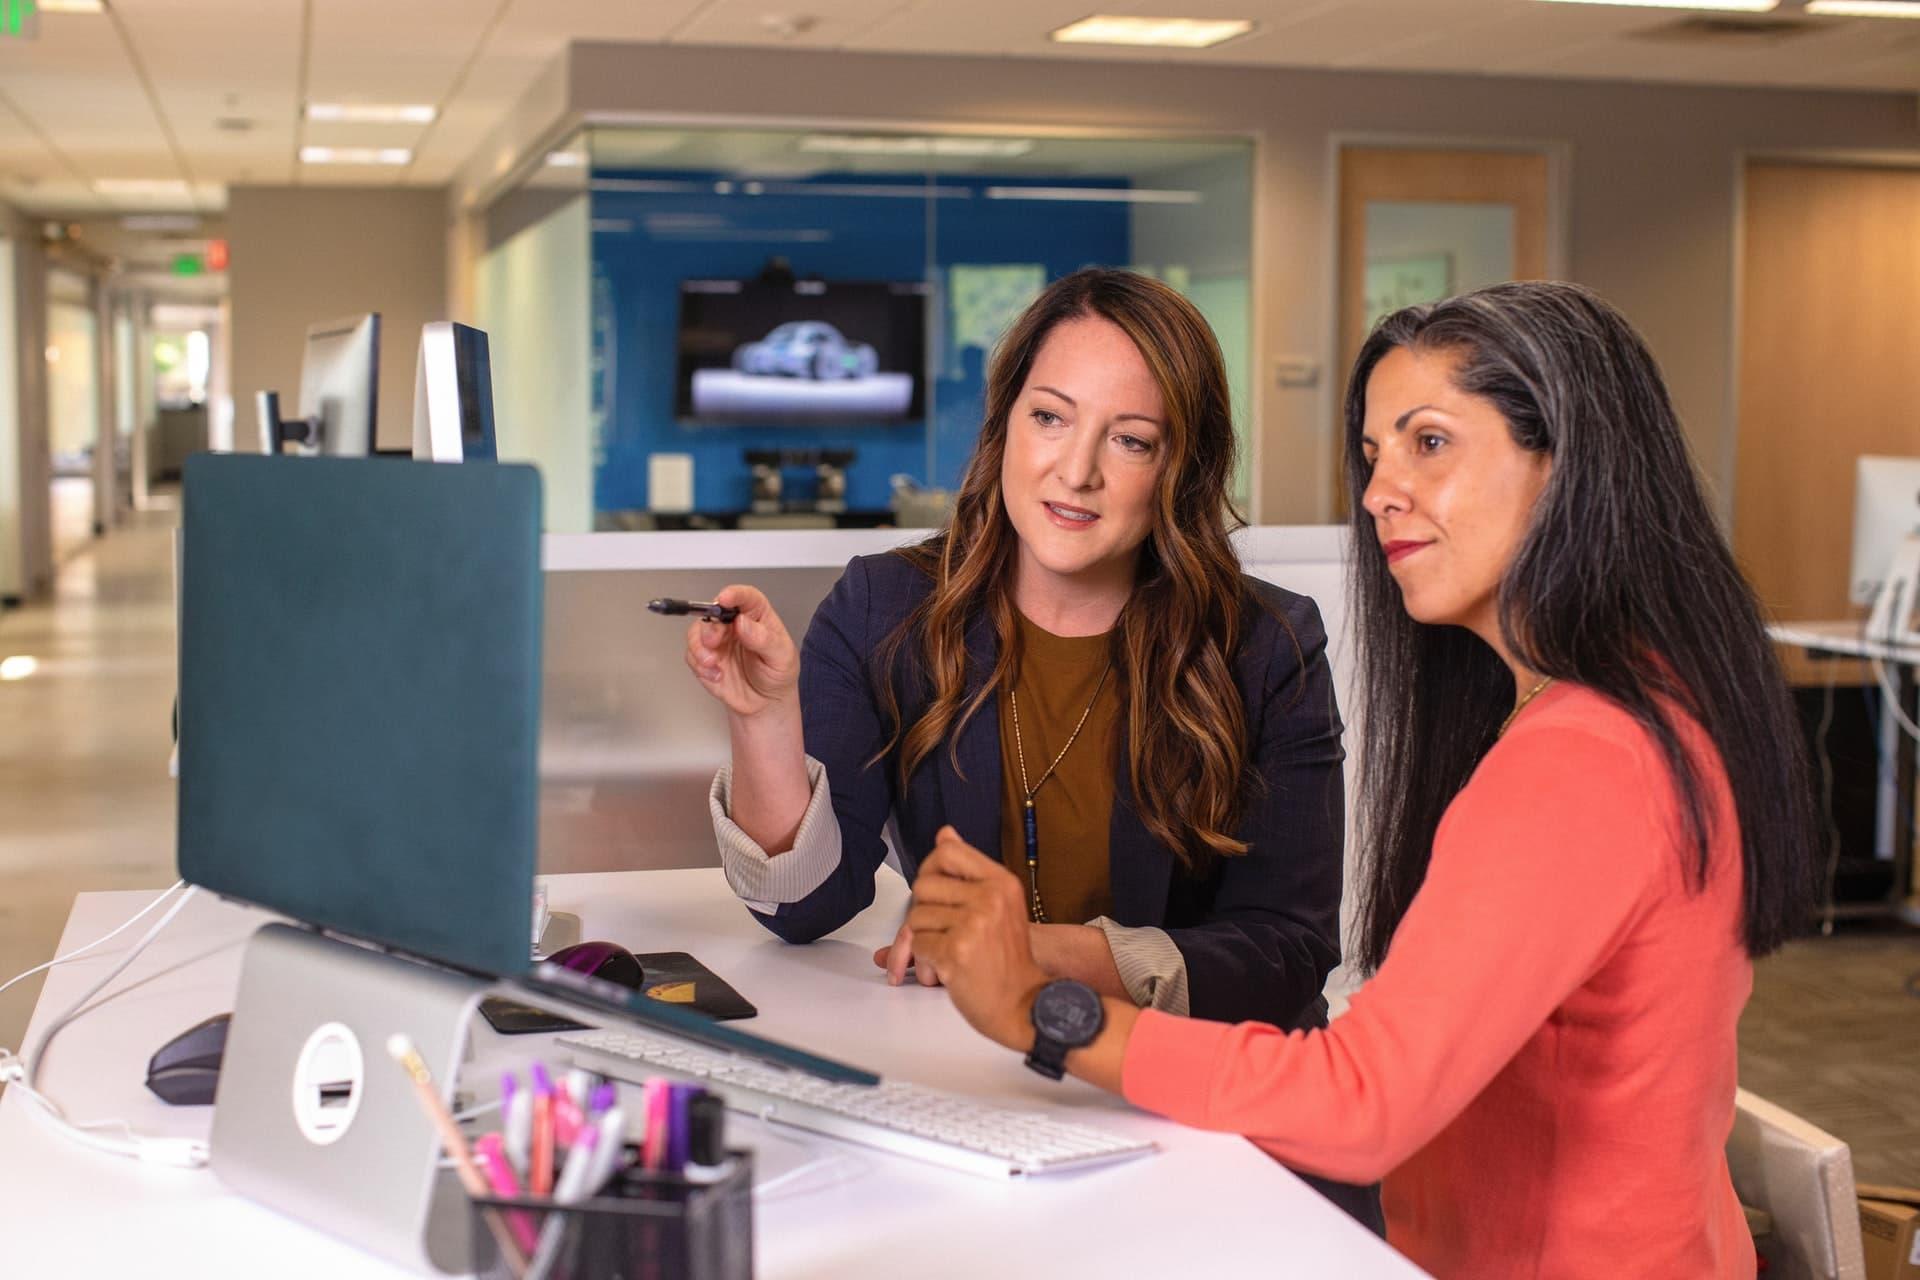 Evidence Technology - Optimizar y hacer crecer negocios